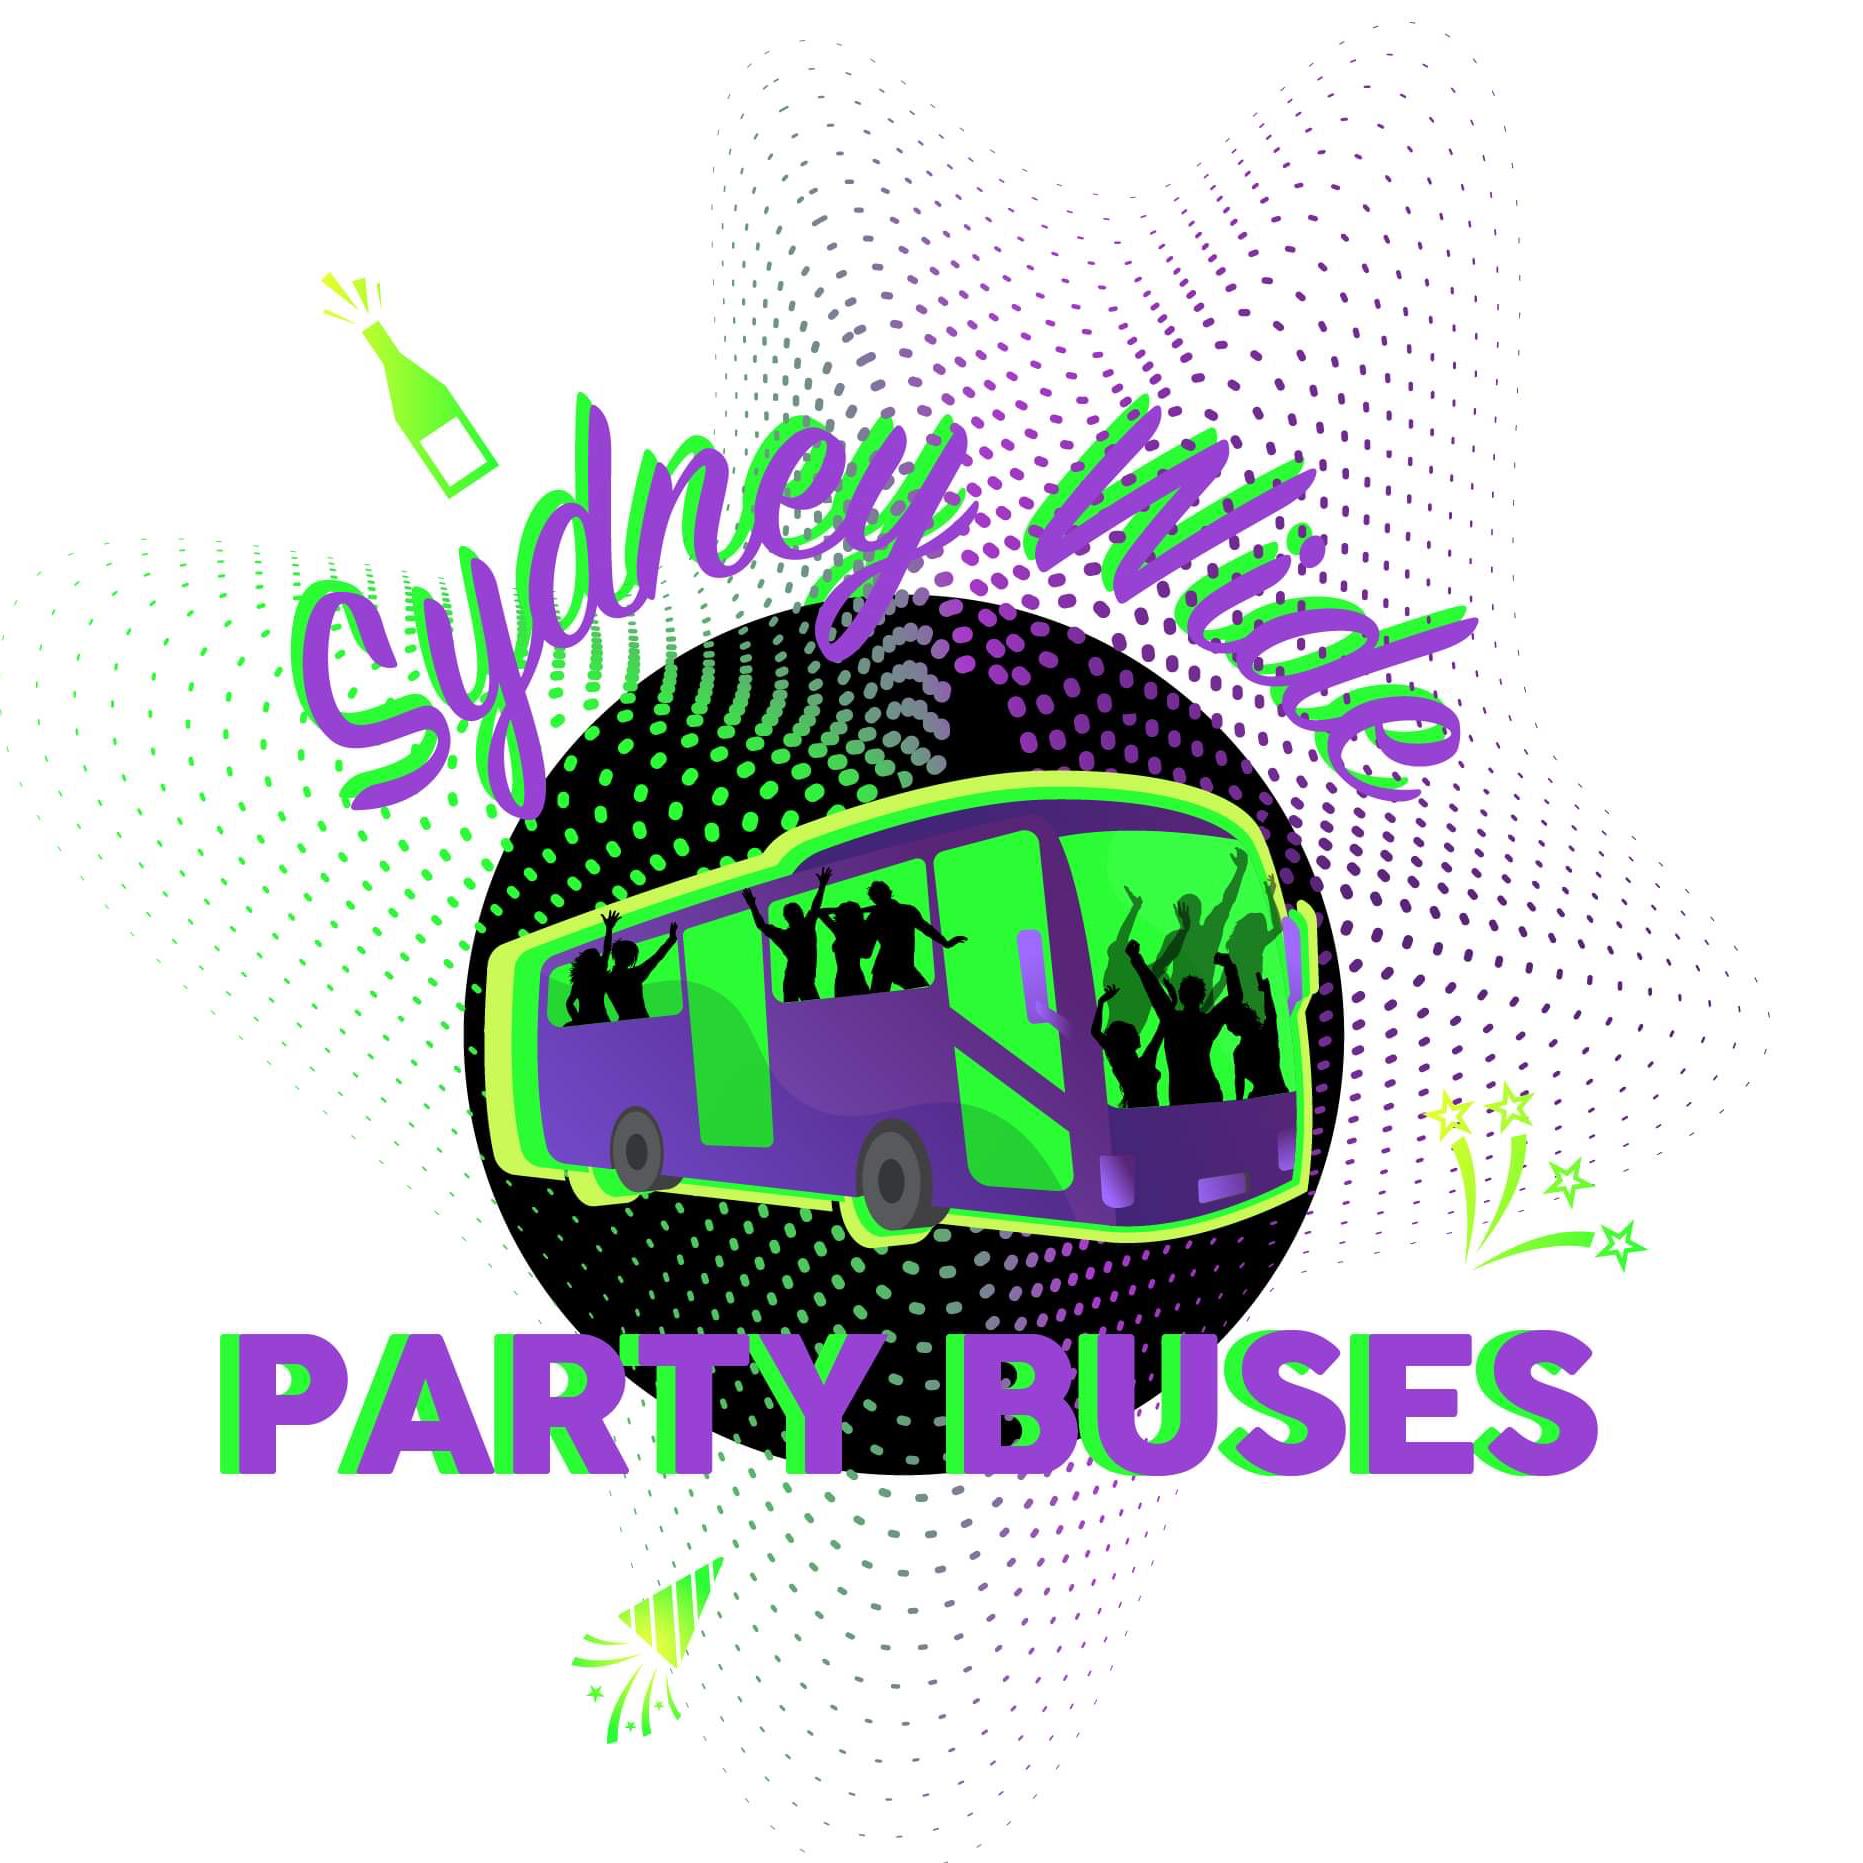 Sydneywidepartybuses